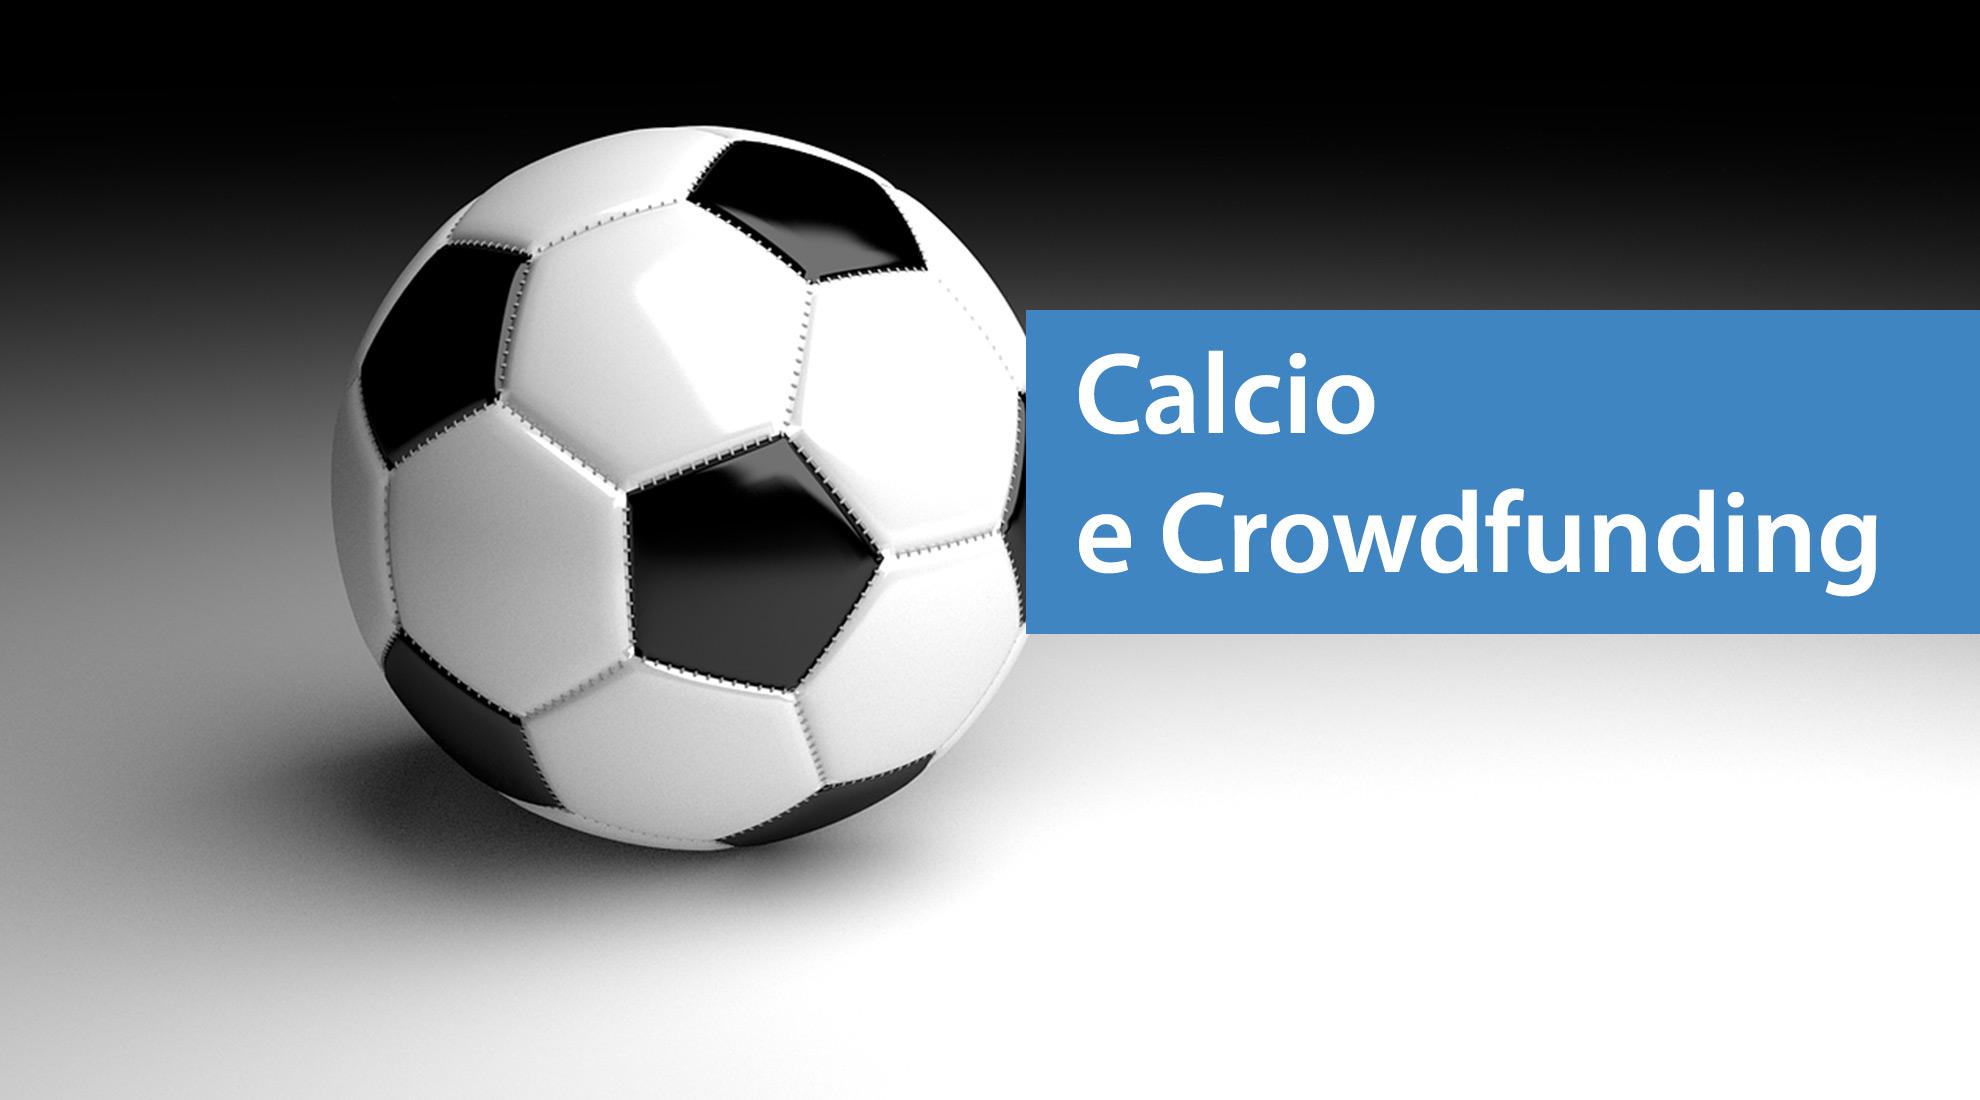 calcio-e-crowdfunding.jpg